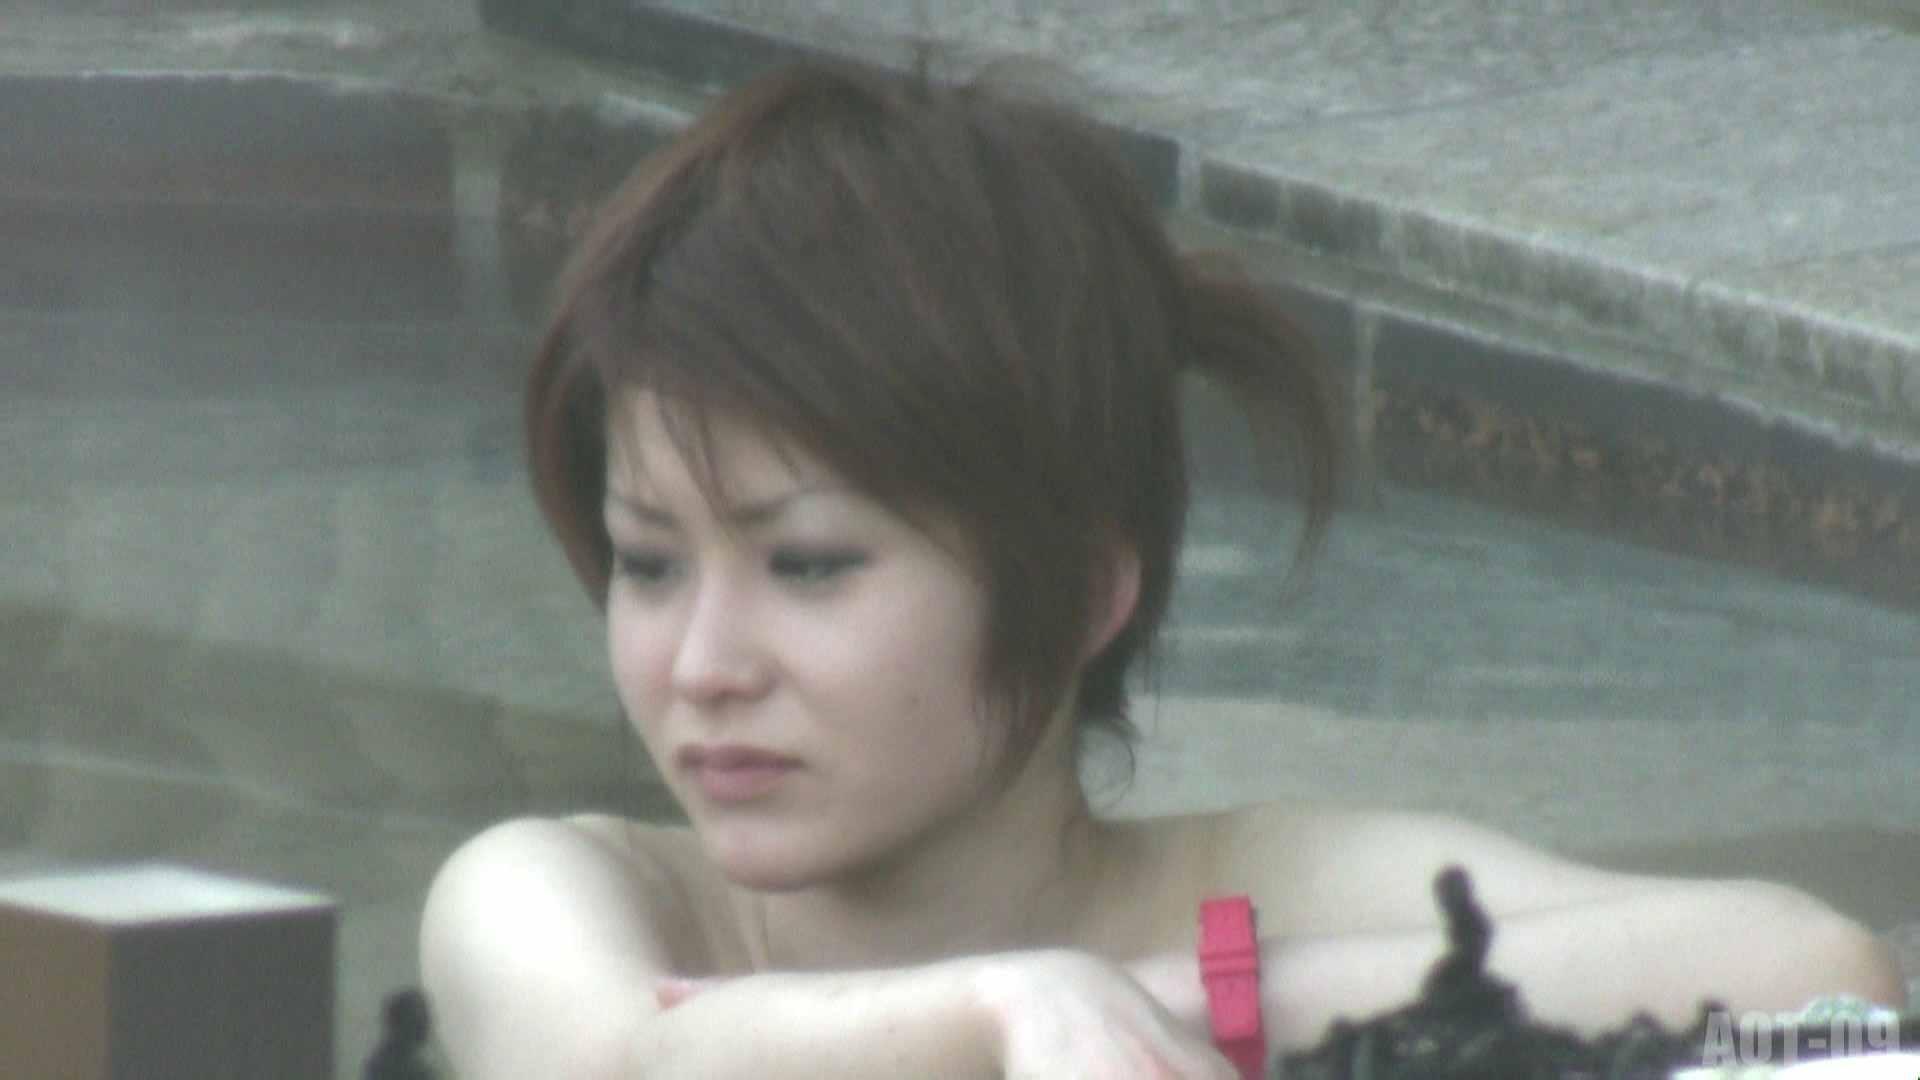 Aquaな露天風呂Vol.779 露天風呂 | OLのエロ生活  81連発 79